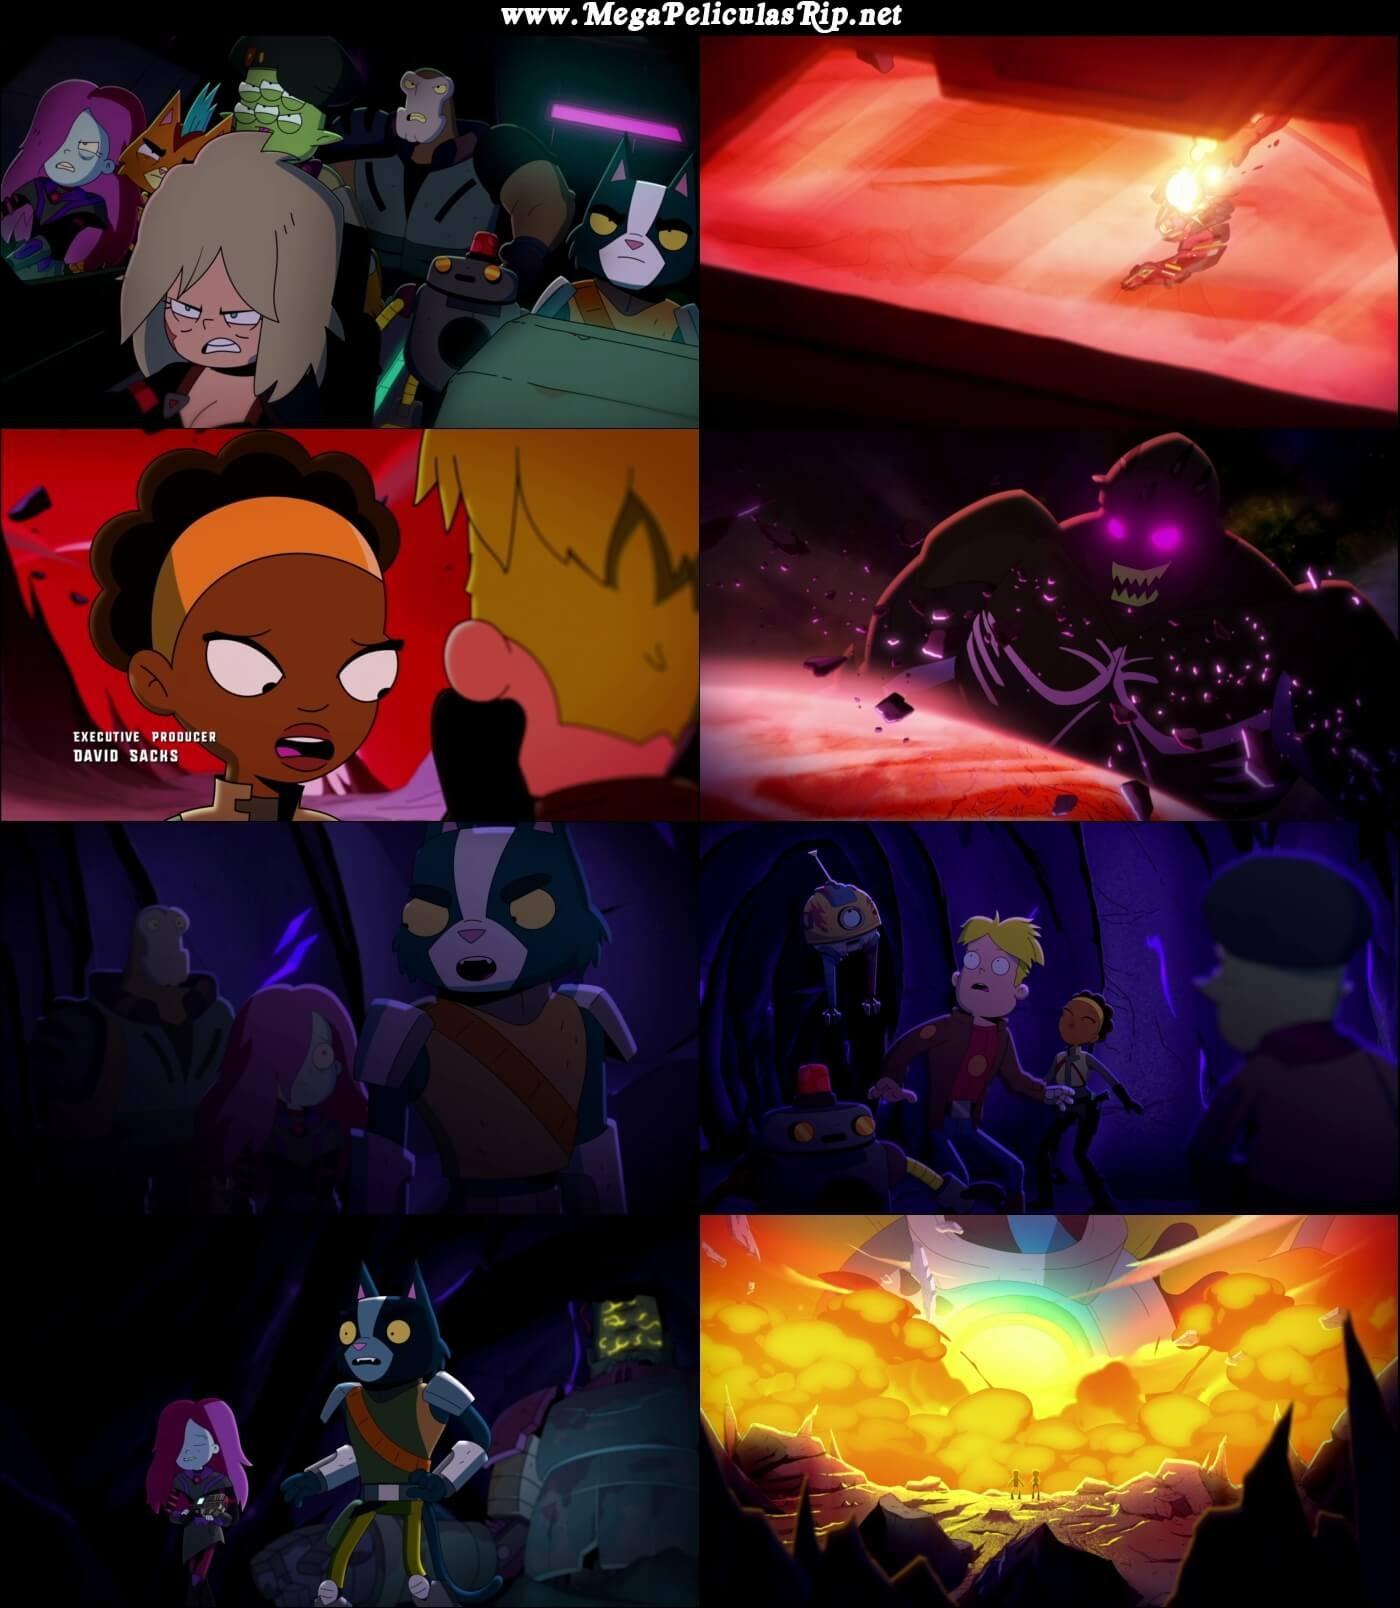 Final Space Temporada 3 1080p Latino